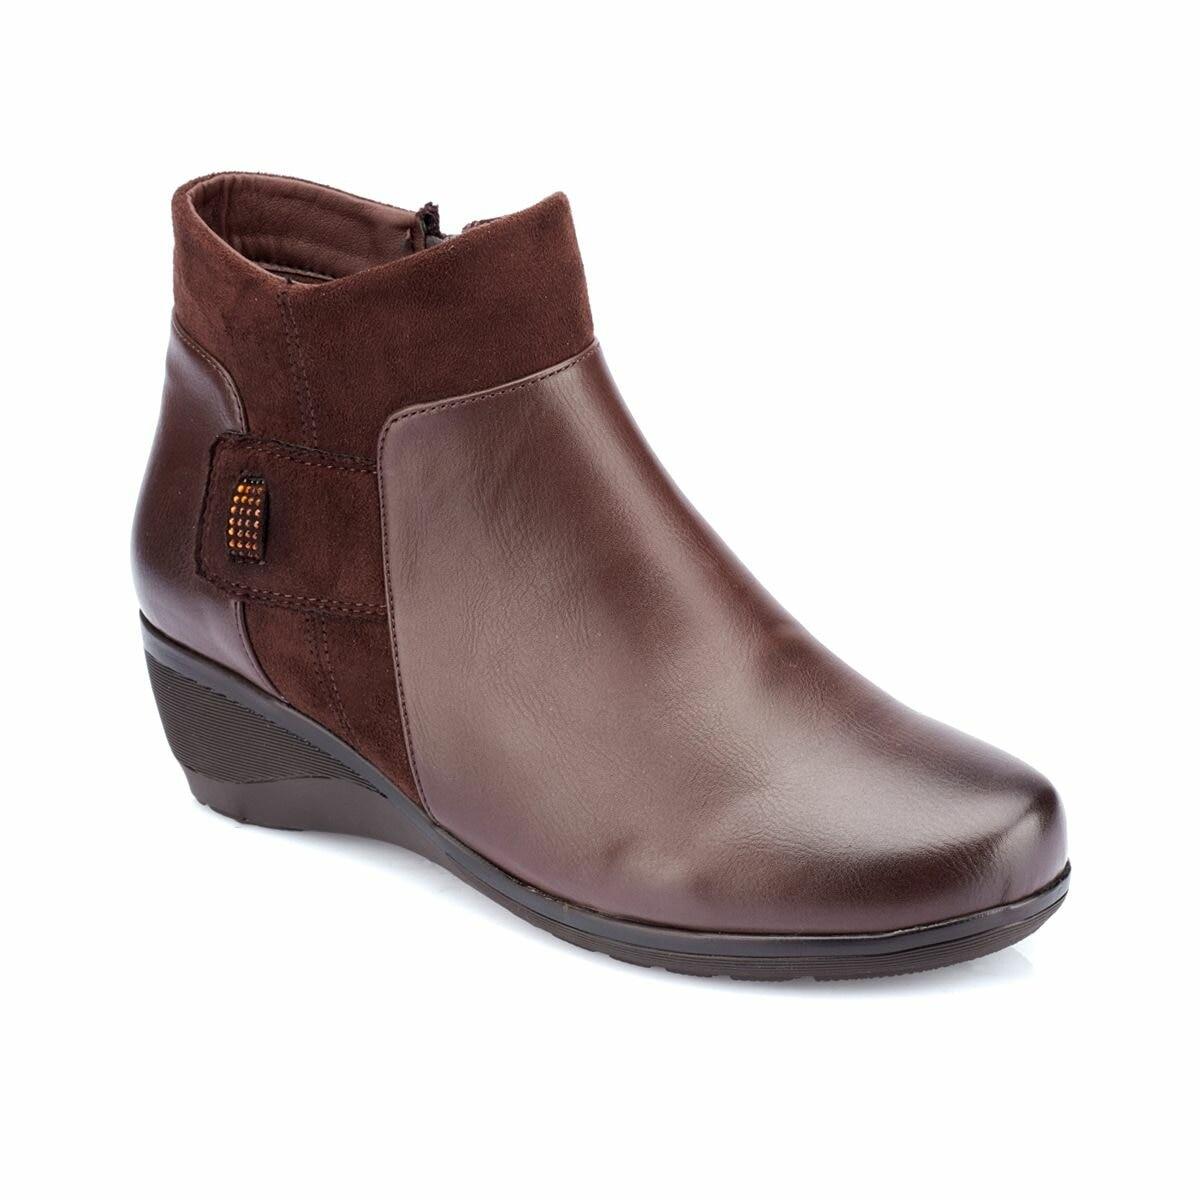 FLO 82.150417.Z Brown Women 'S Boots Polaris